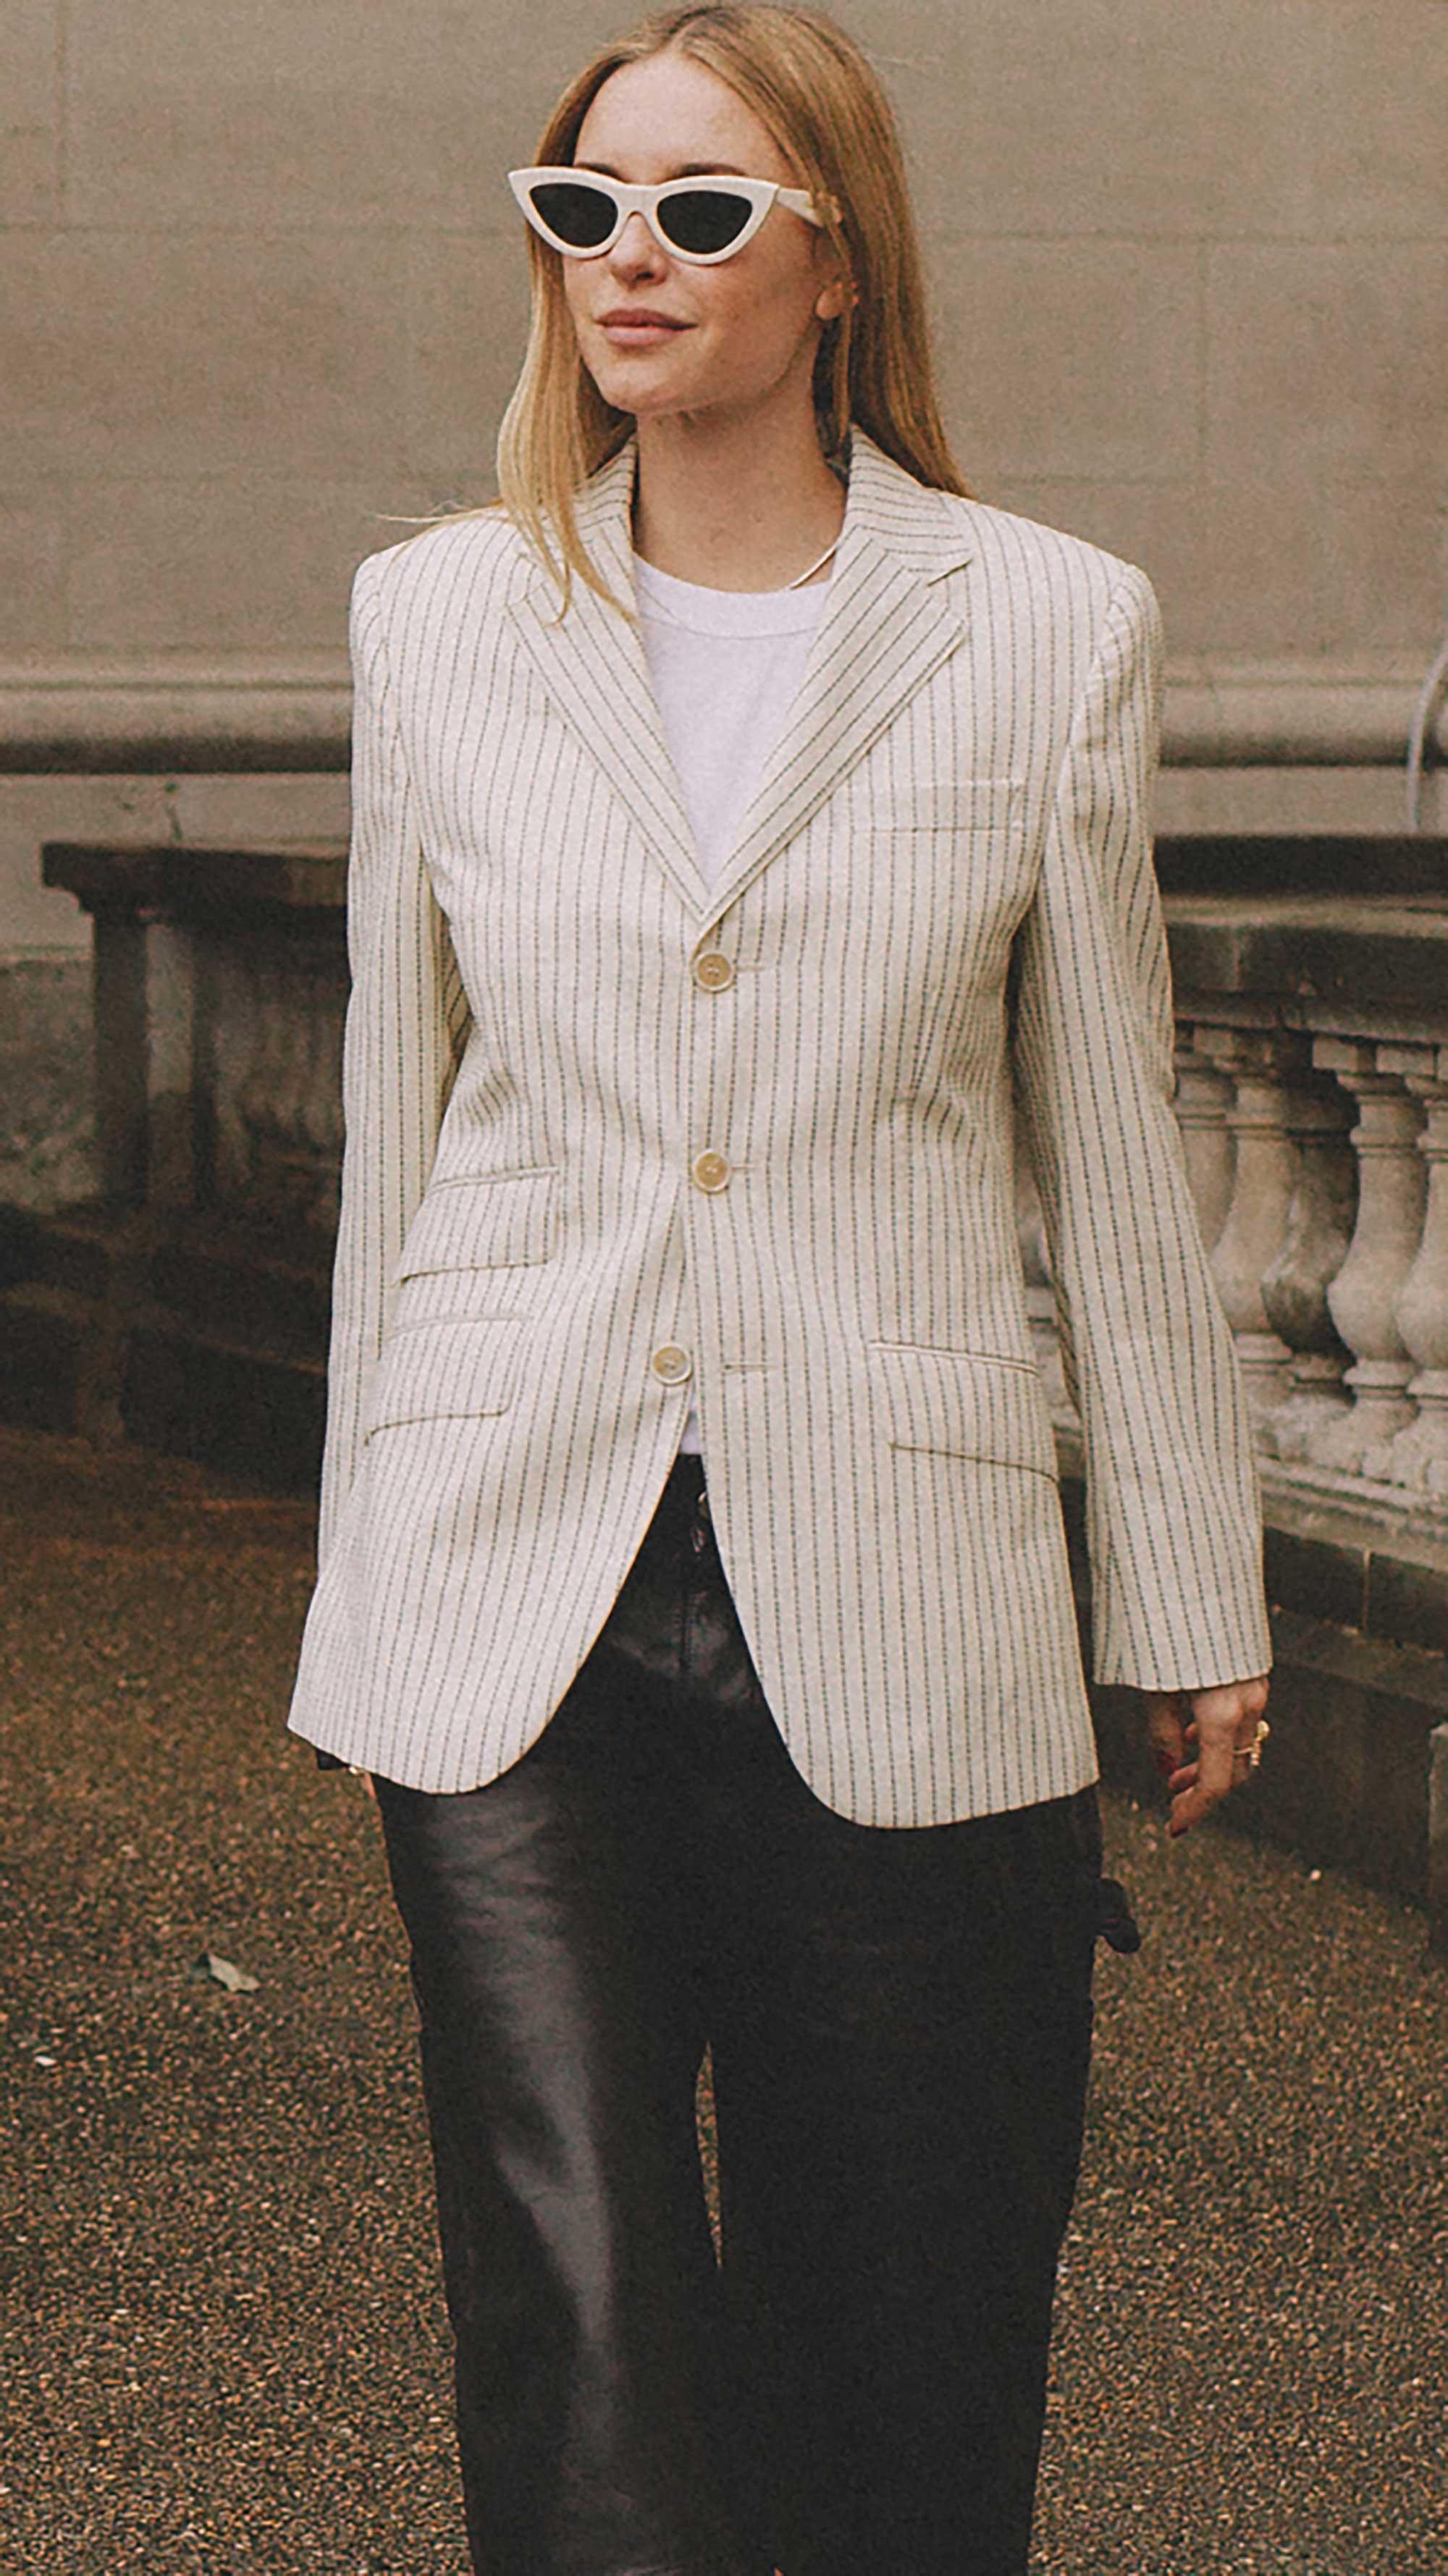 Best outfits of Paris Fashion Week street style 2019 day two PFW SS20 Photo by @J2martinez Jose J. Martinez -35.jpg